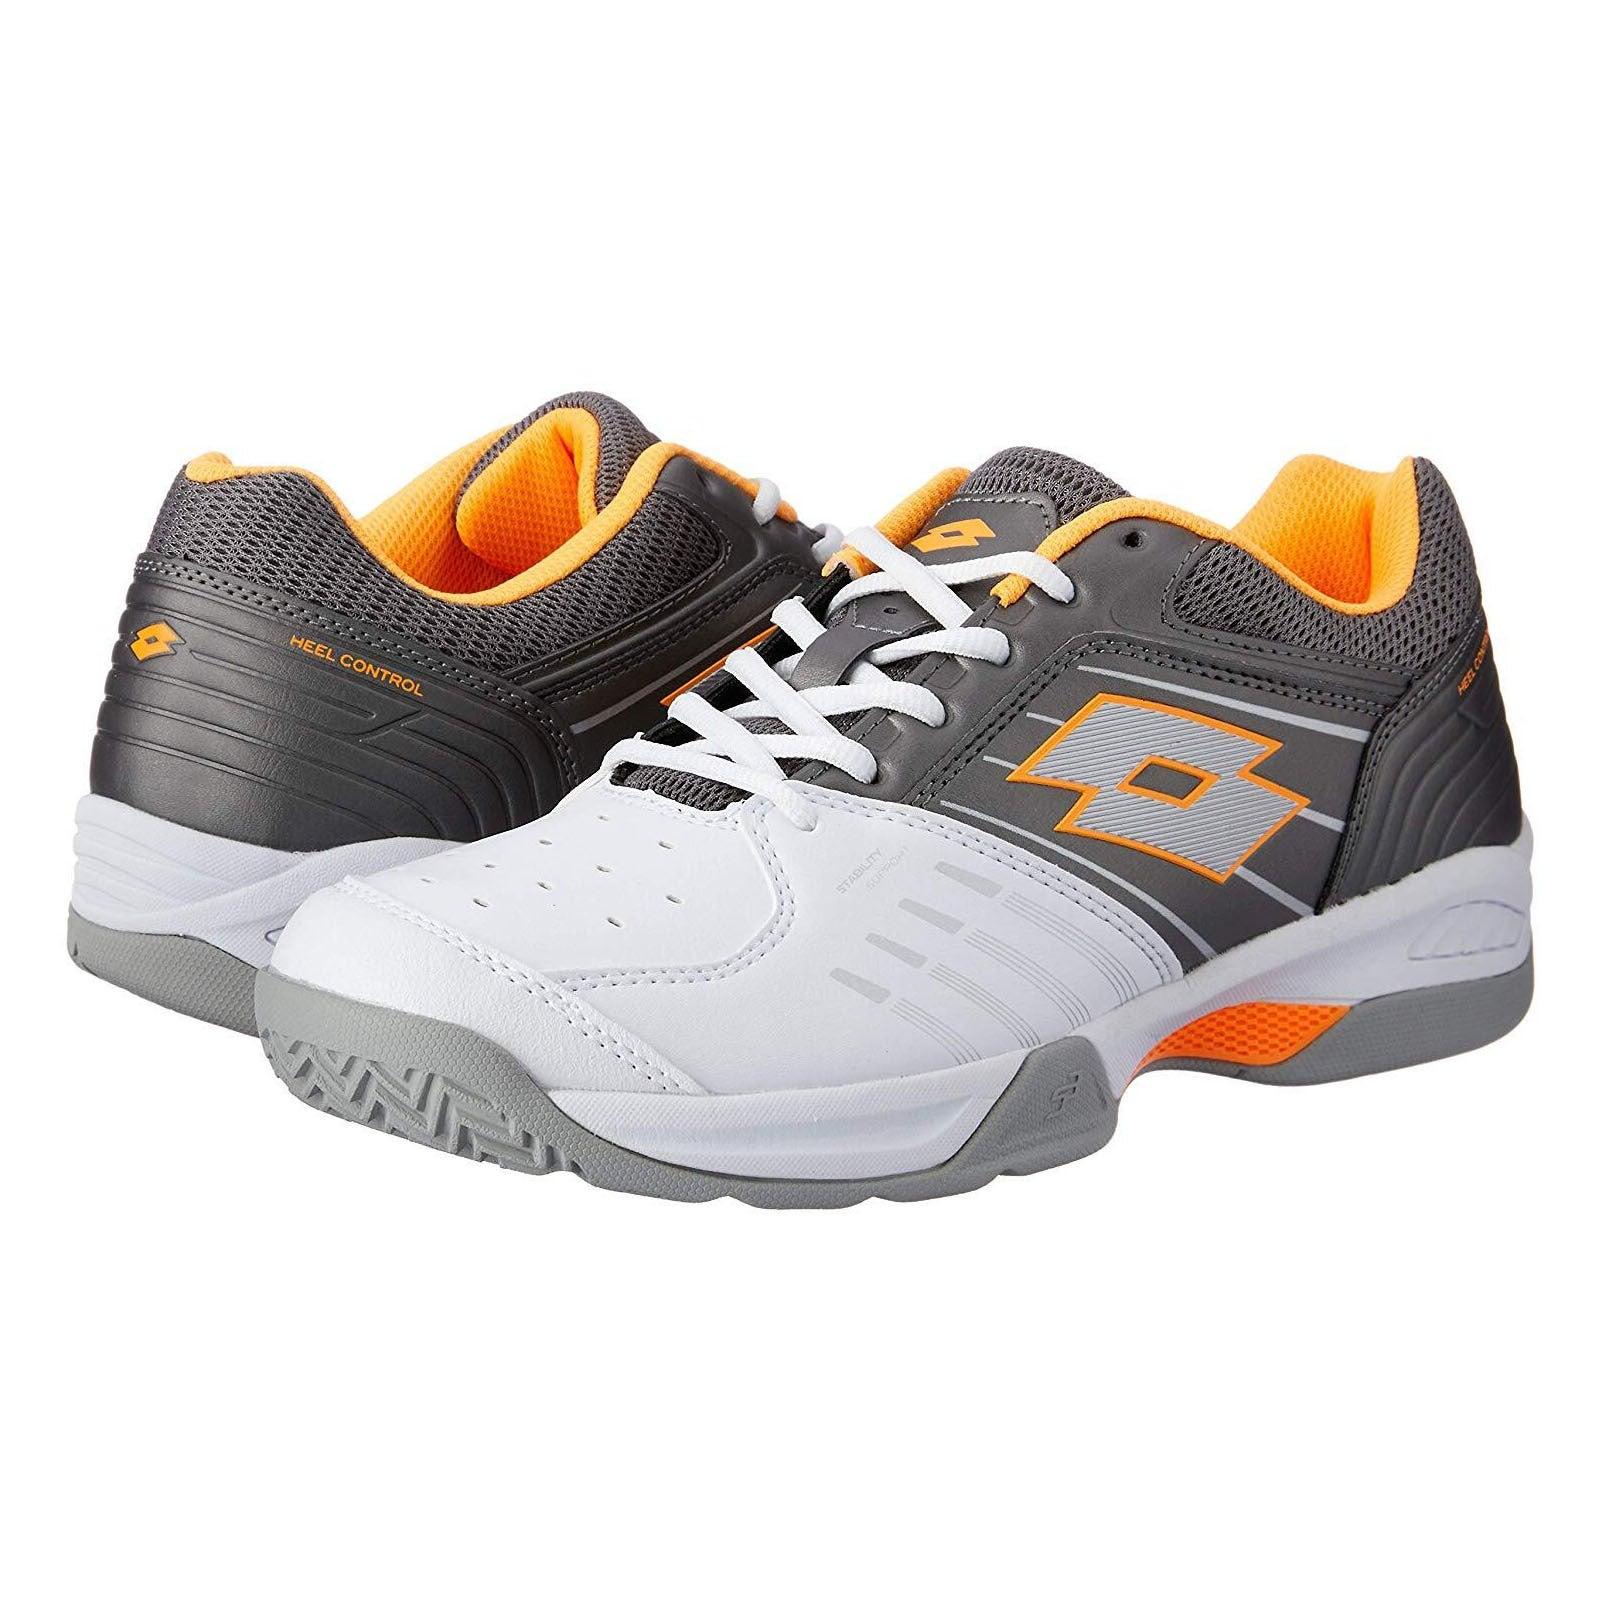 Fast Men's Adidas Black Silver Running Shoes Titan Show